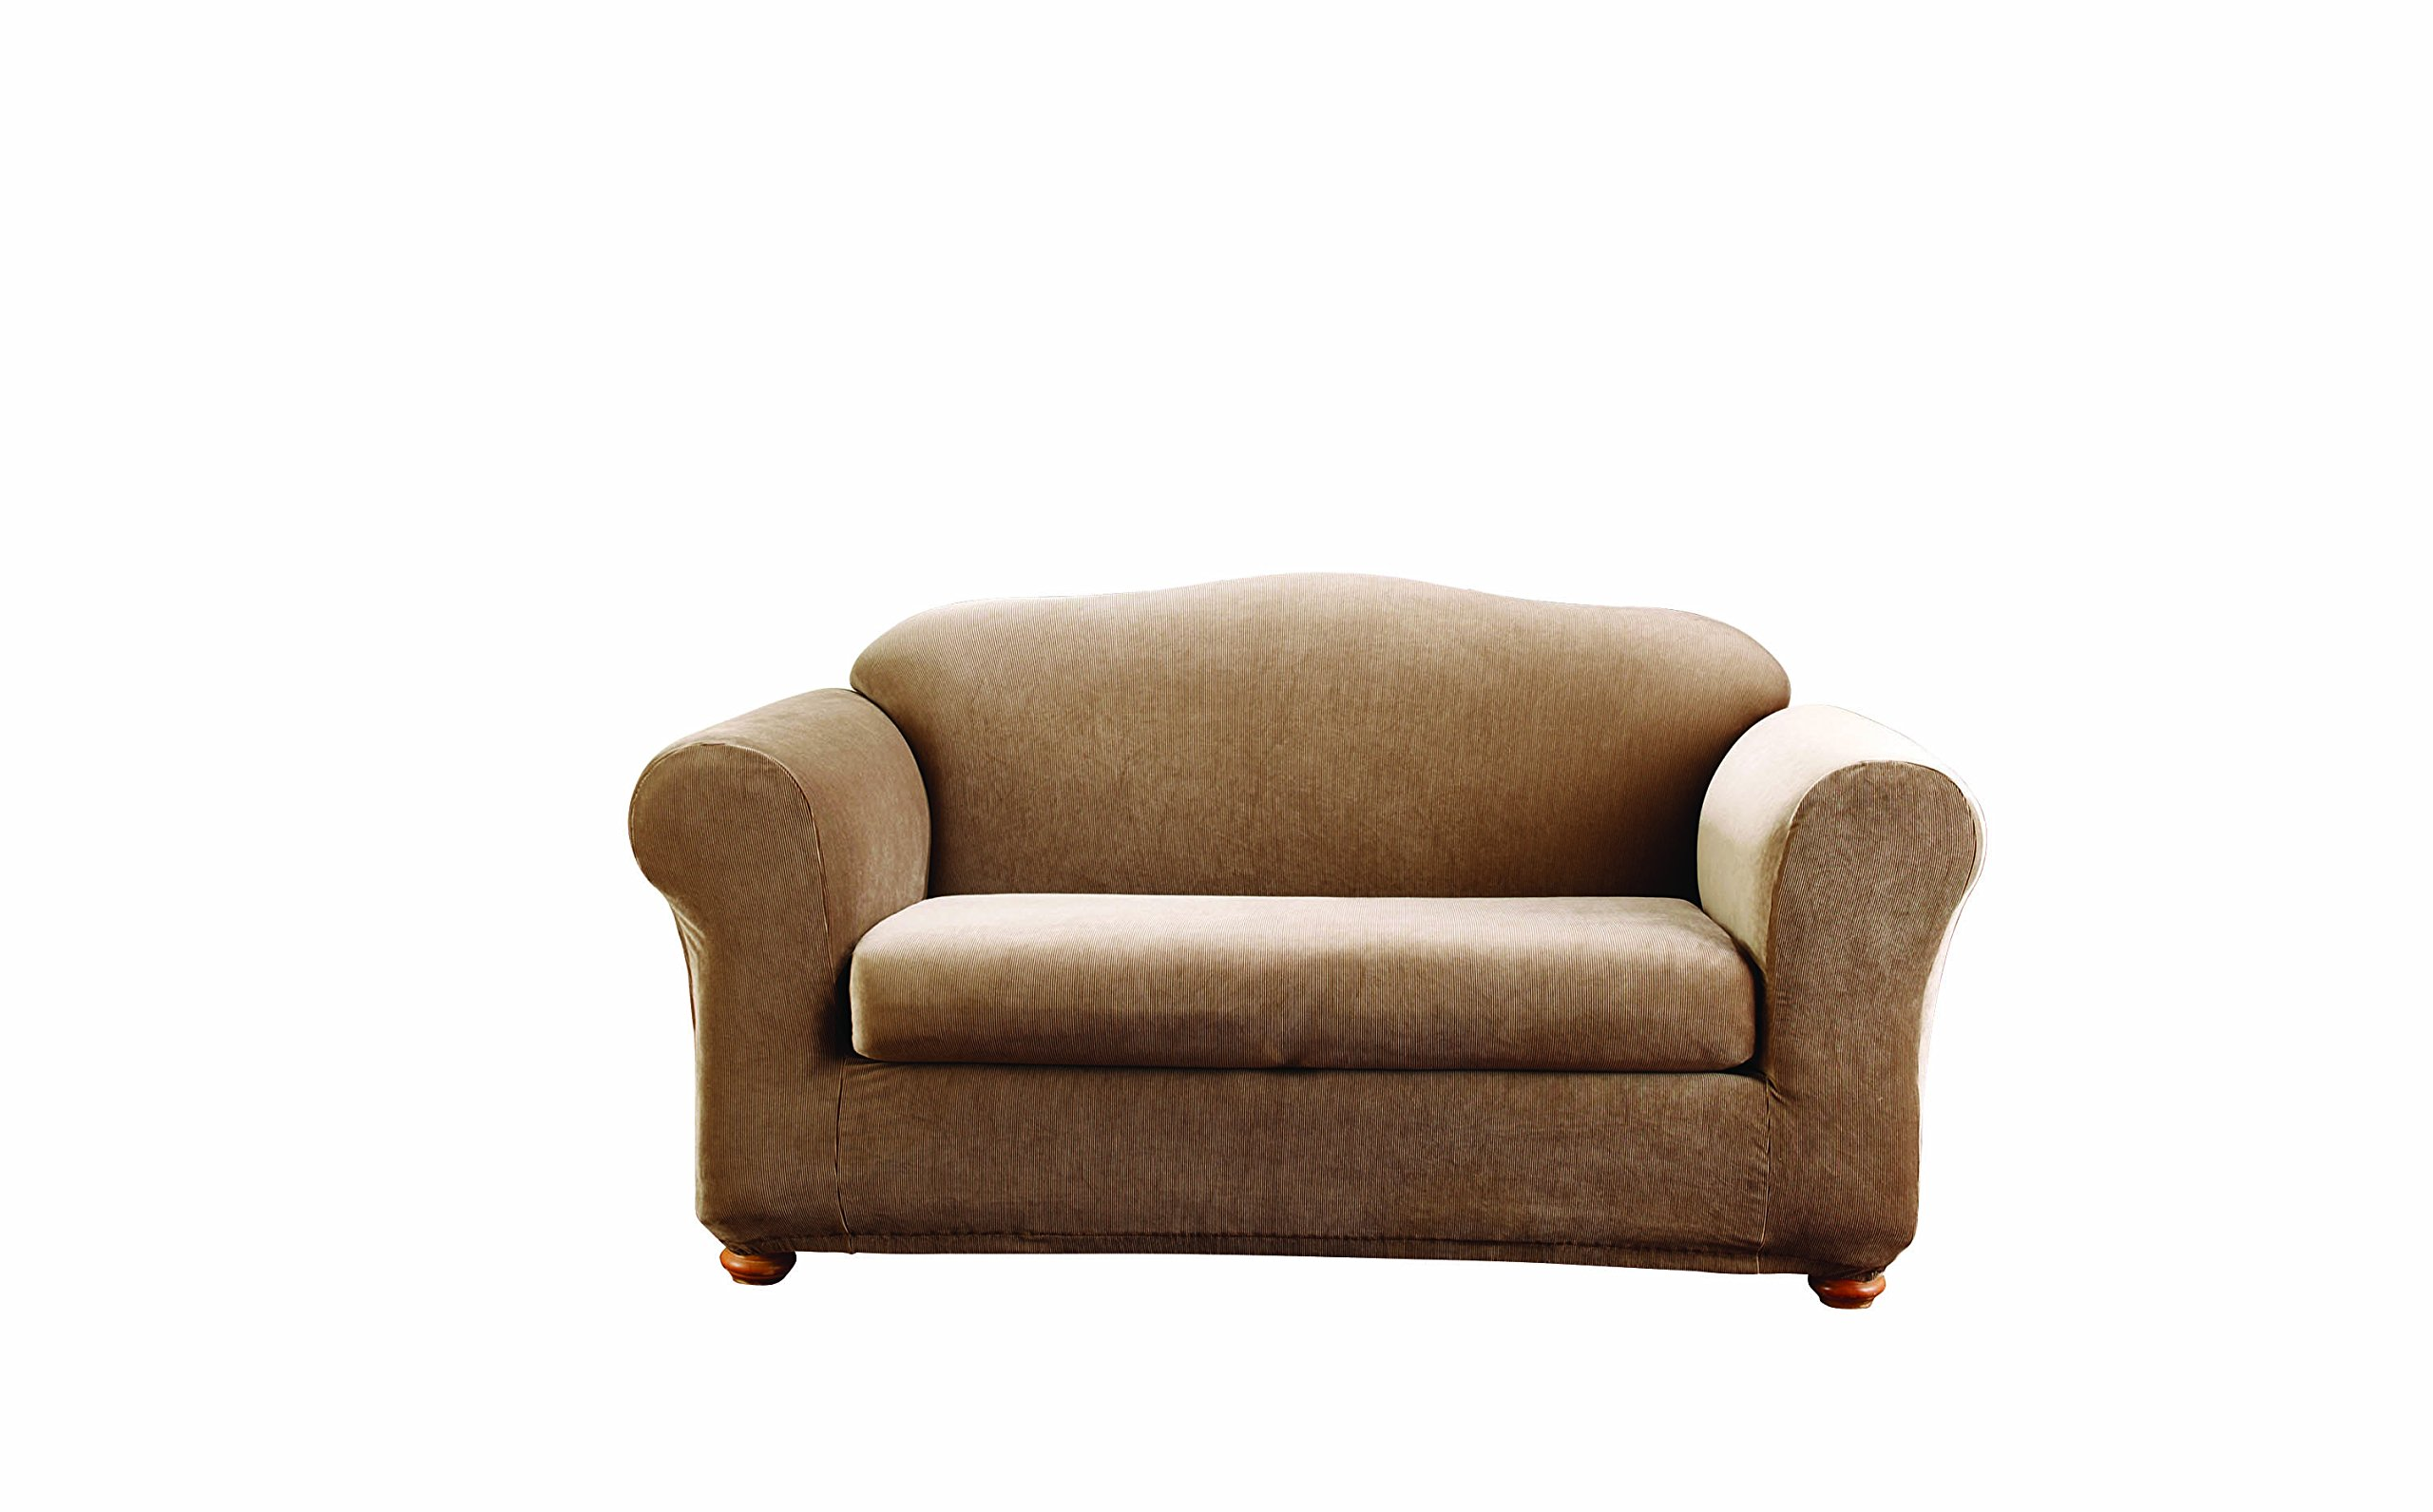 Sure Fit Stretch Stripe 2-Piece - Sofa Slipcover  - Brown (SF37630) by Surefit